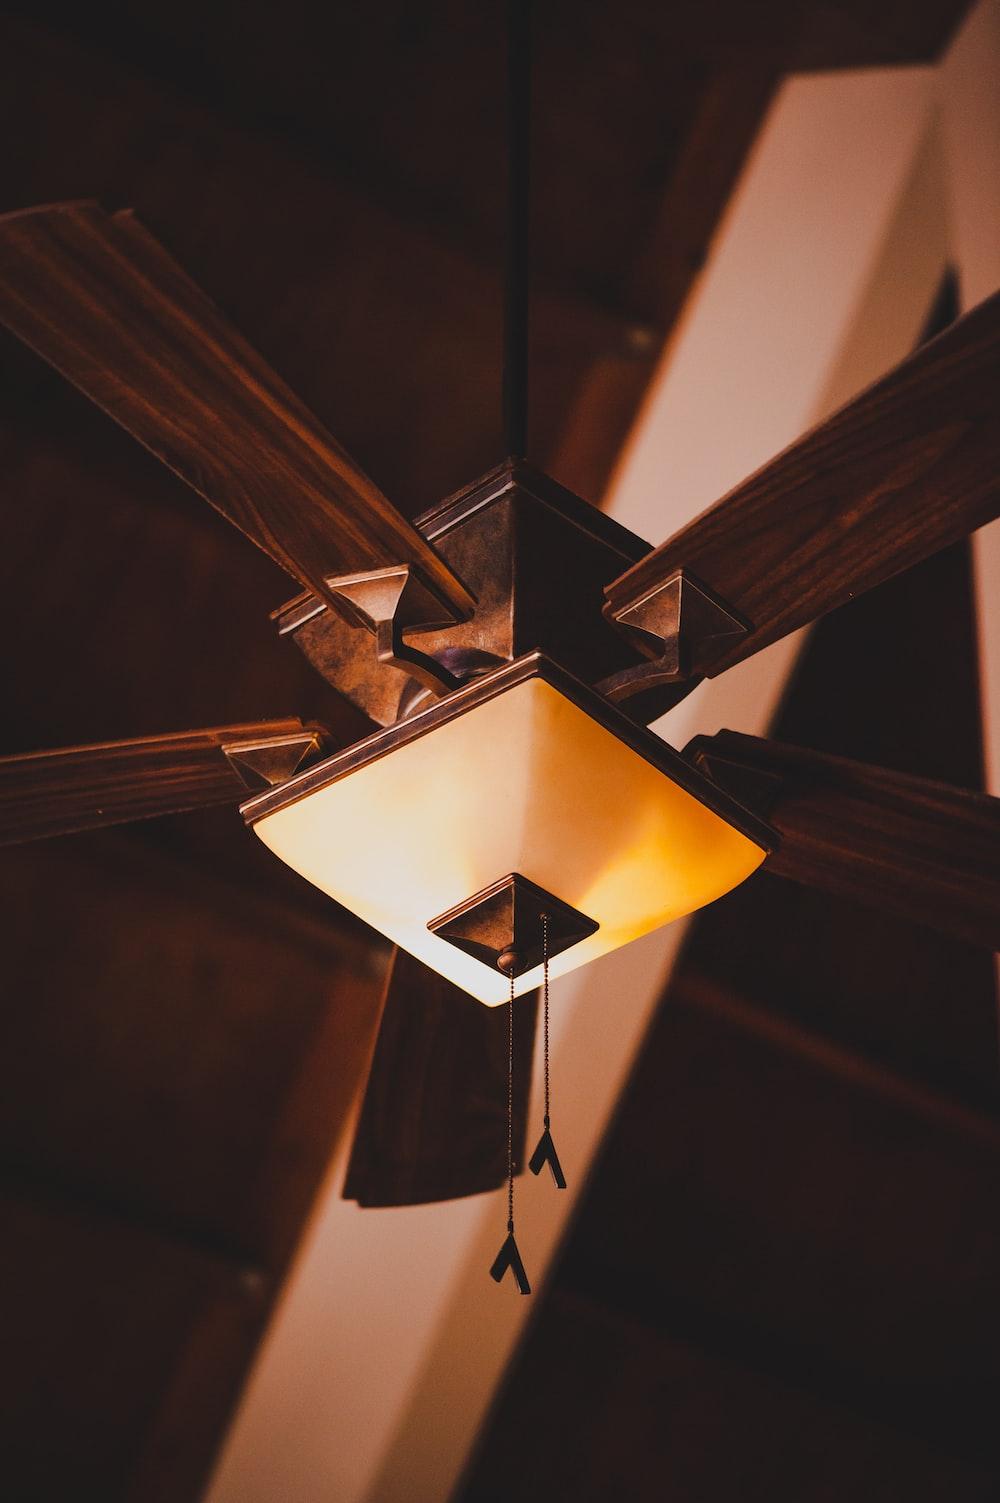 brown 5-blade ceiling fan